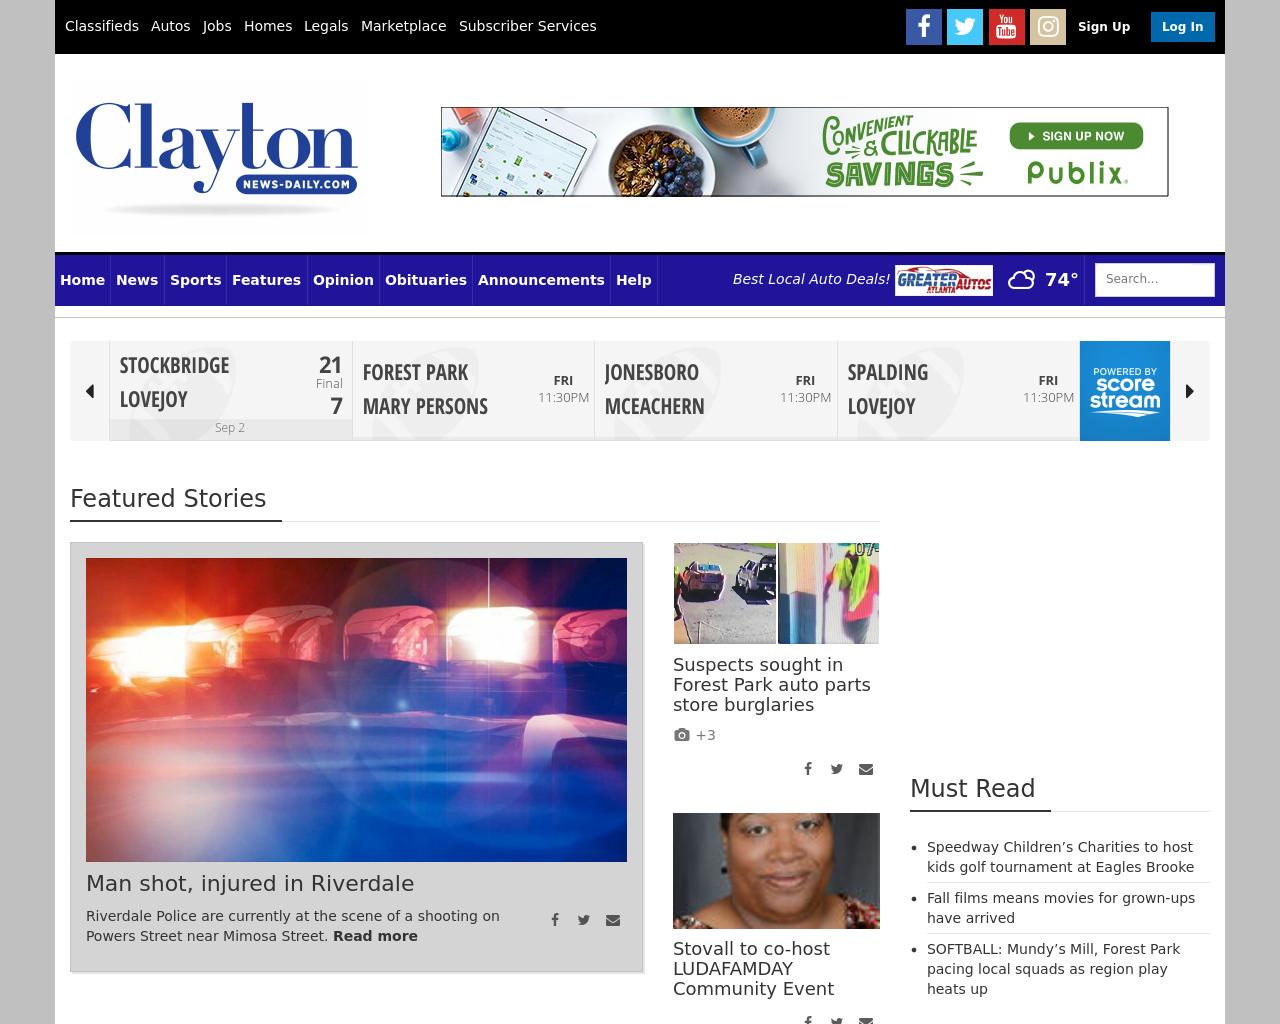 News-daily.com-Advertising-Reviews-Pricing